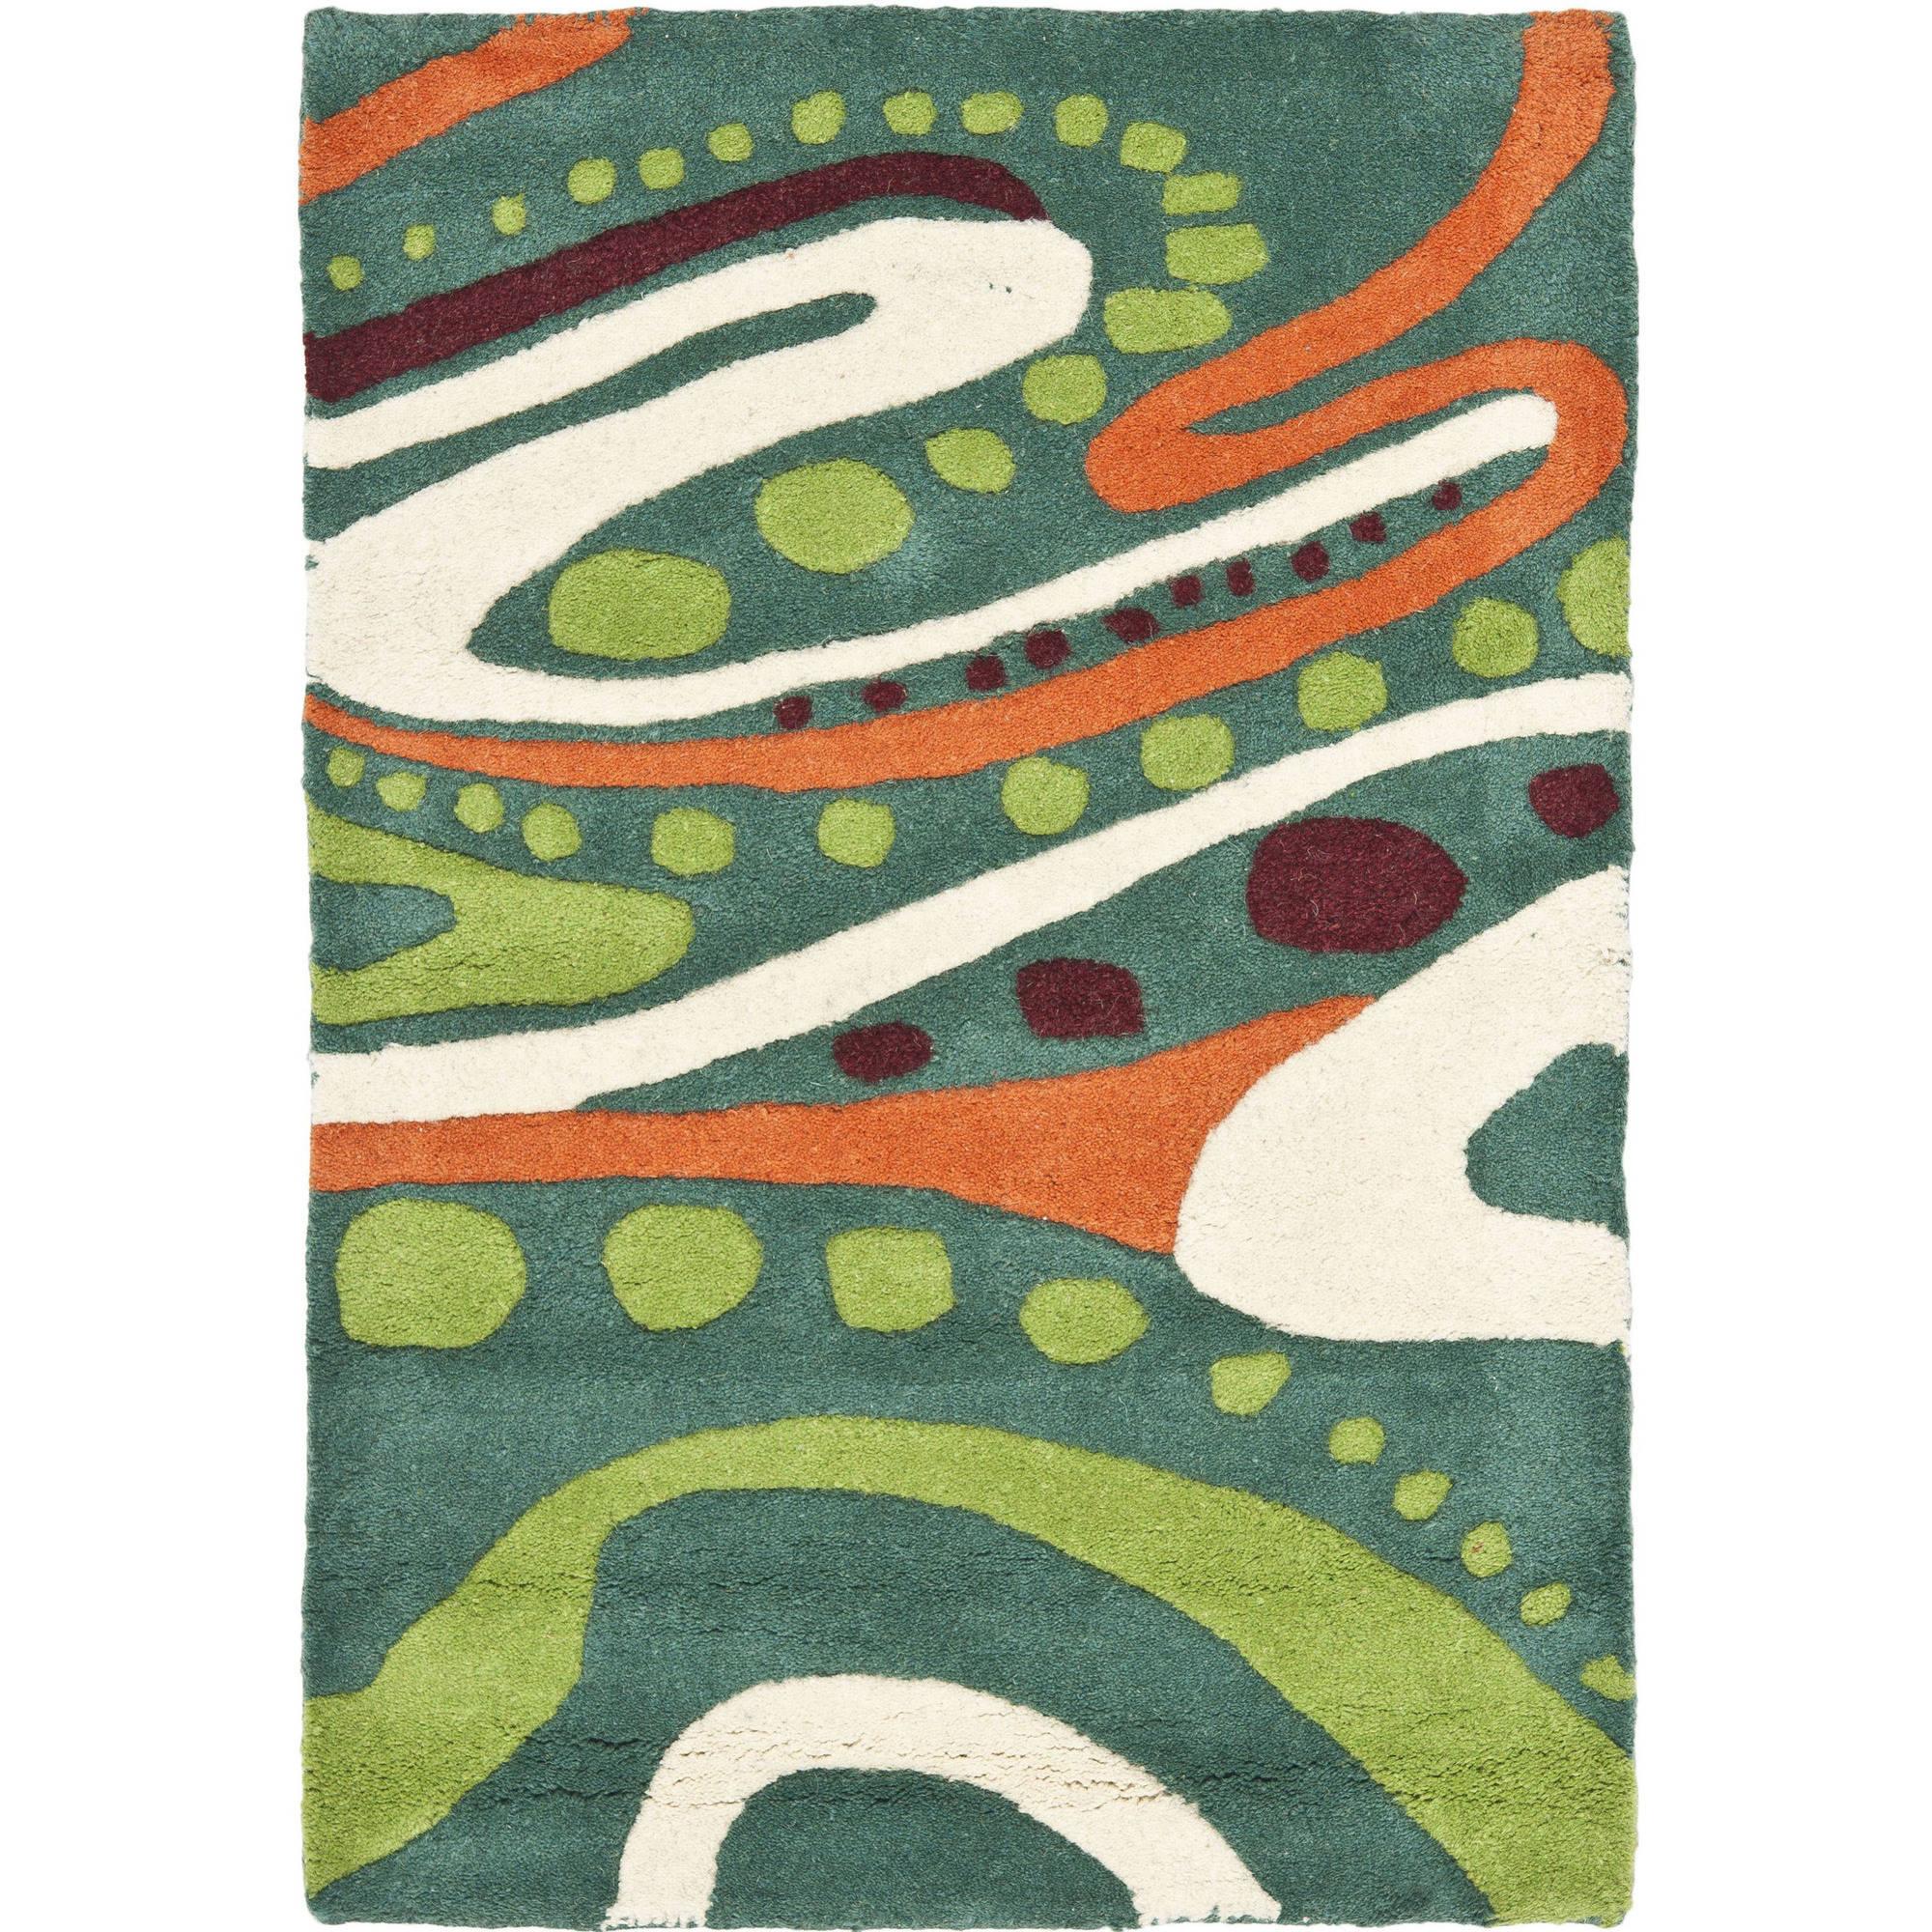 Safavieh Soho Cheryl Abstract Wool Area Rug or Runner